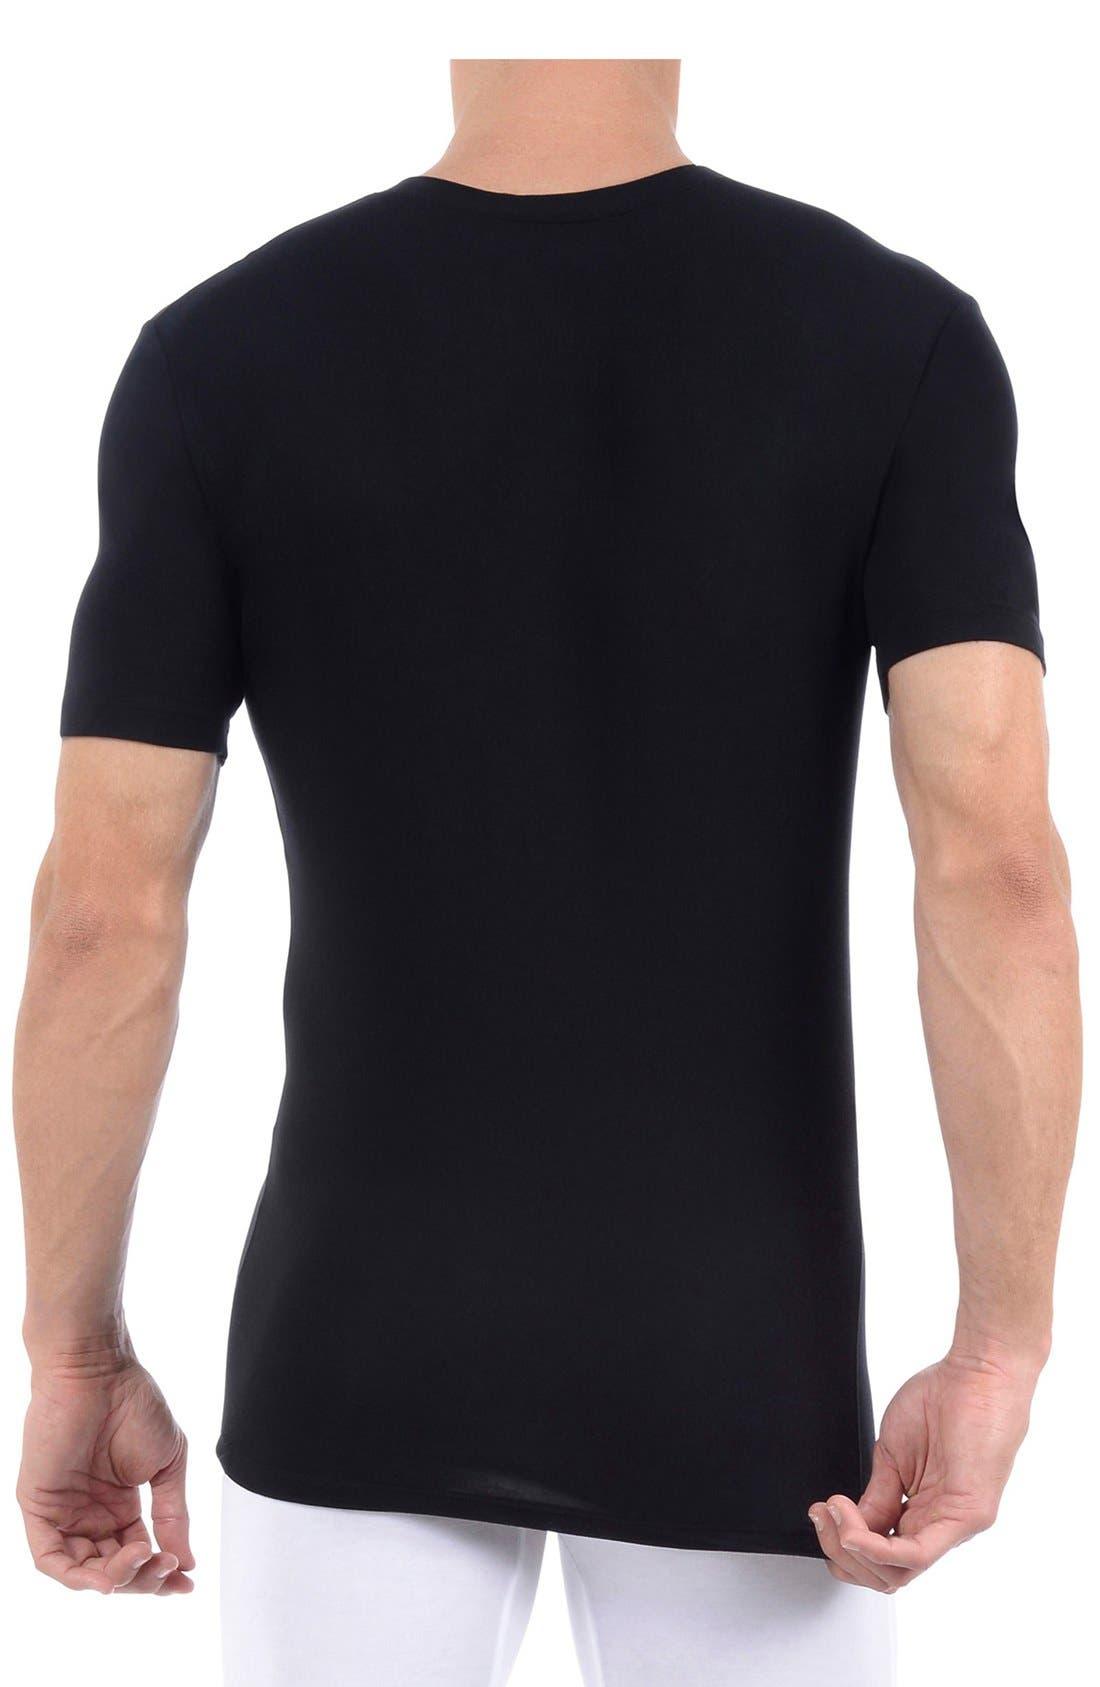 Alternate Image 2  - Tommy John 'Cool Cotton' High V-Neck Undershirt